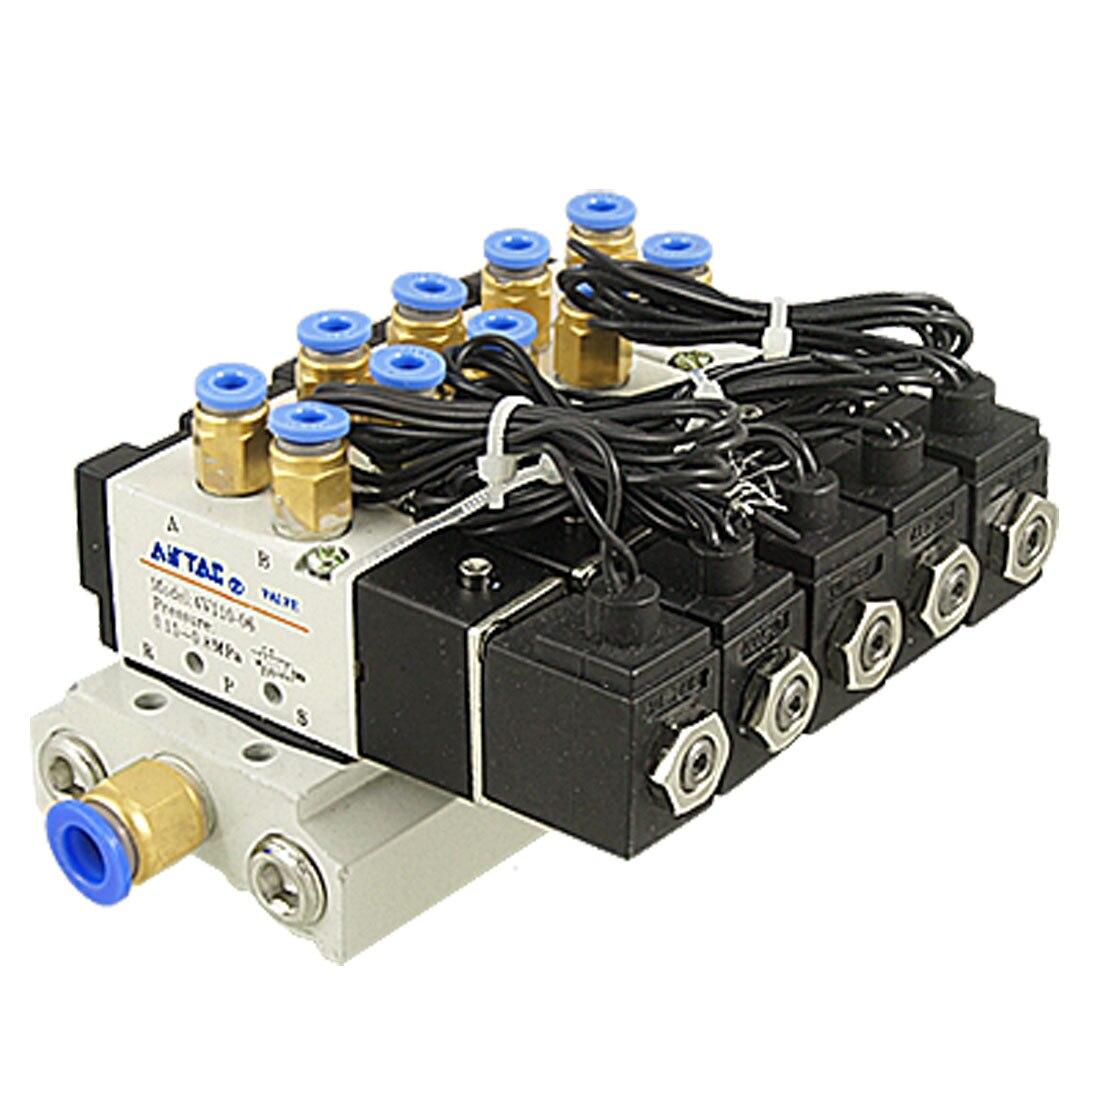 DC 24V 5/32 Quick Fitting 2 Position 5 Way 5 Solenoid Valve w Base Muffler pc400 5 pc400lc 5 pc300lc 5 pc300 5 excavator hydraulic pump solenoid valve 708 23 18272 for komatsu